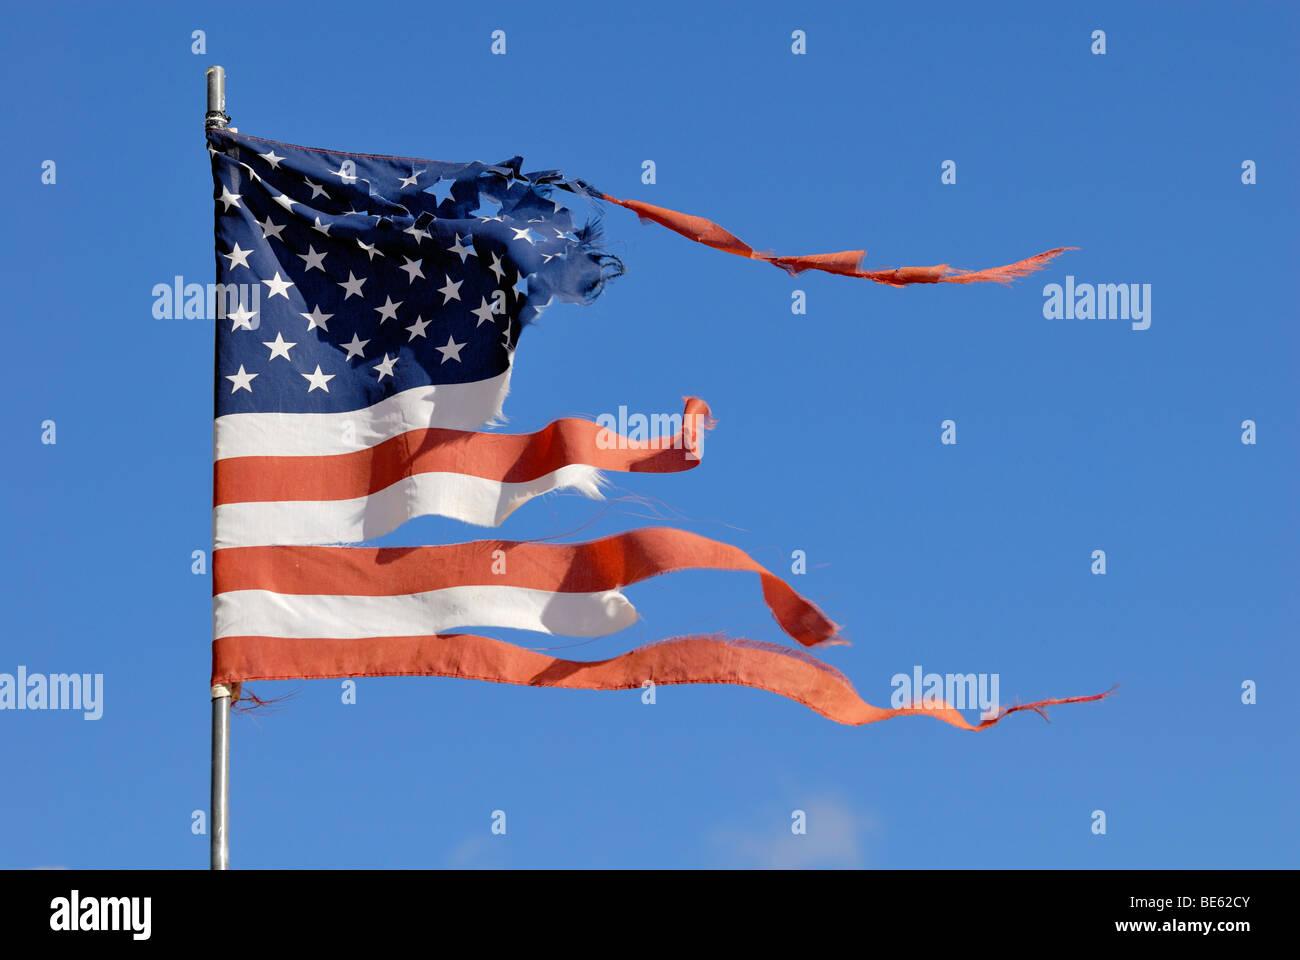 Usa American Torn Flag Stockfotos & Usa American Torn Flag Bilder ...